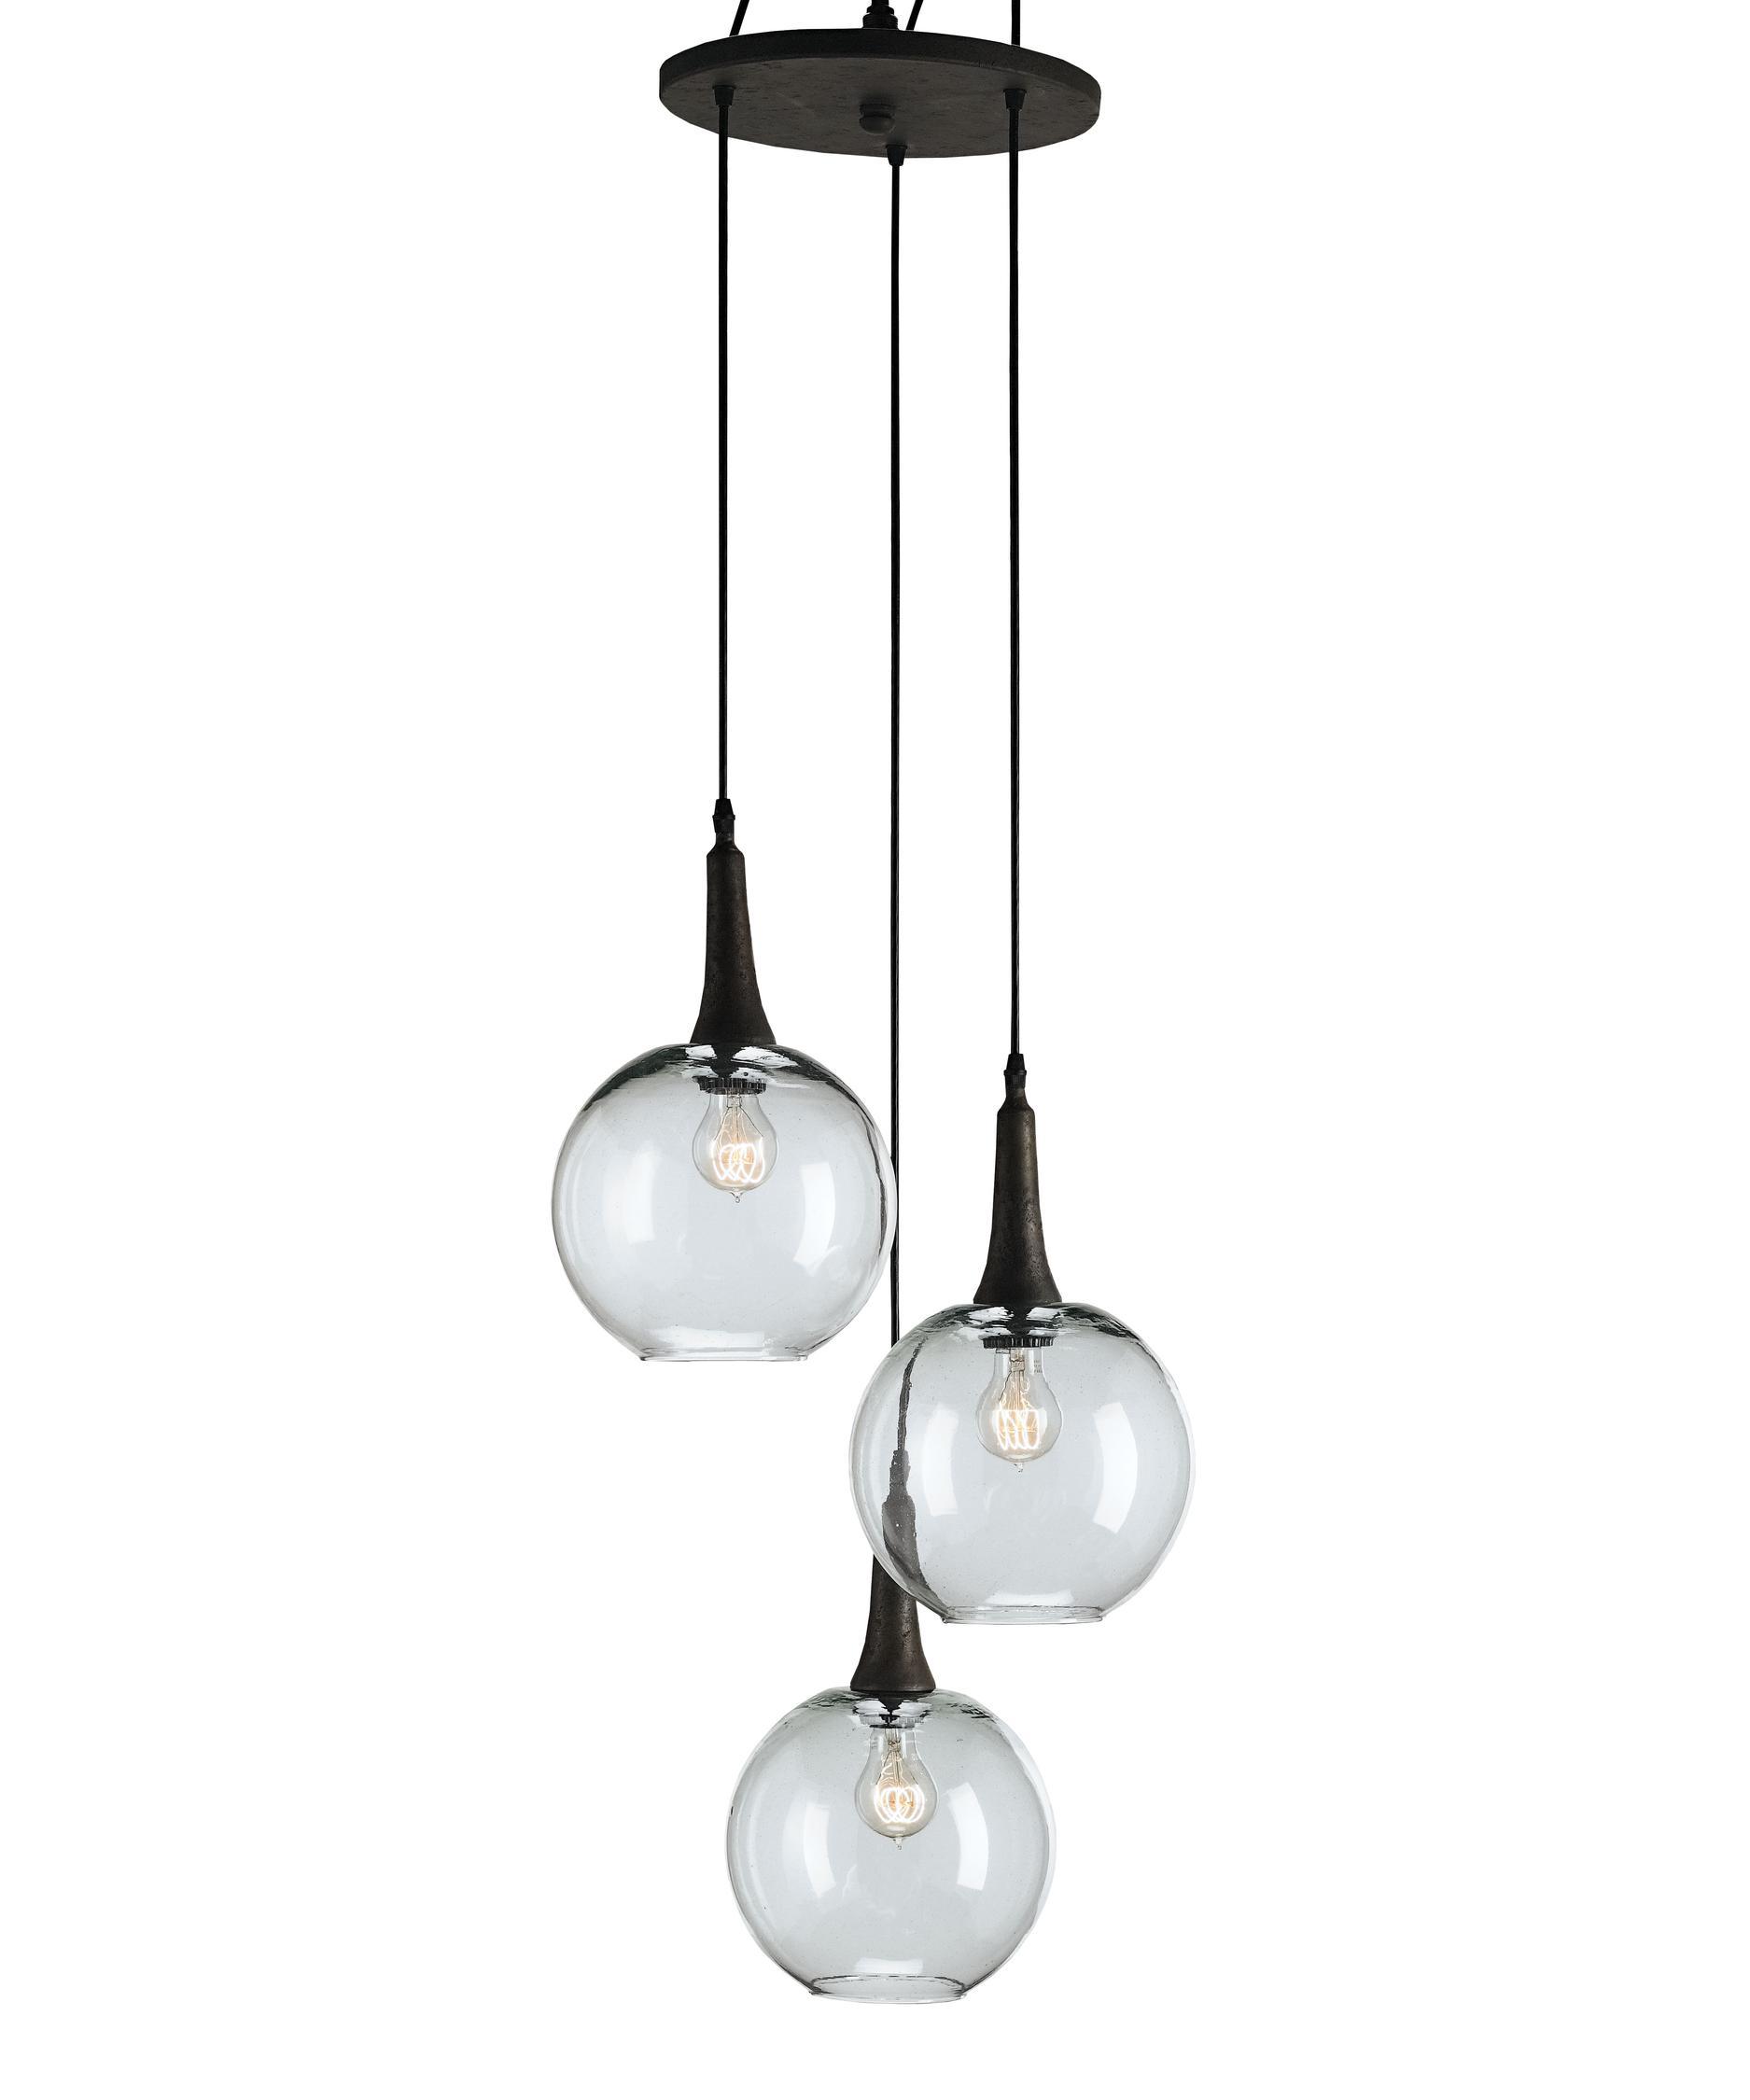 Wiring Three Pendant Lights Wire Center Diagram Two Light Free Photo Lamps Night Long Exposure Rh Jooinn Com Multiple Switch